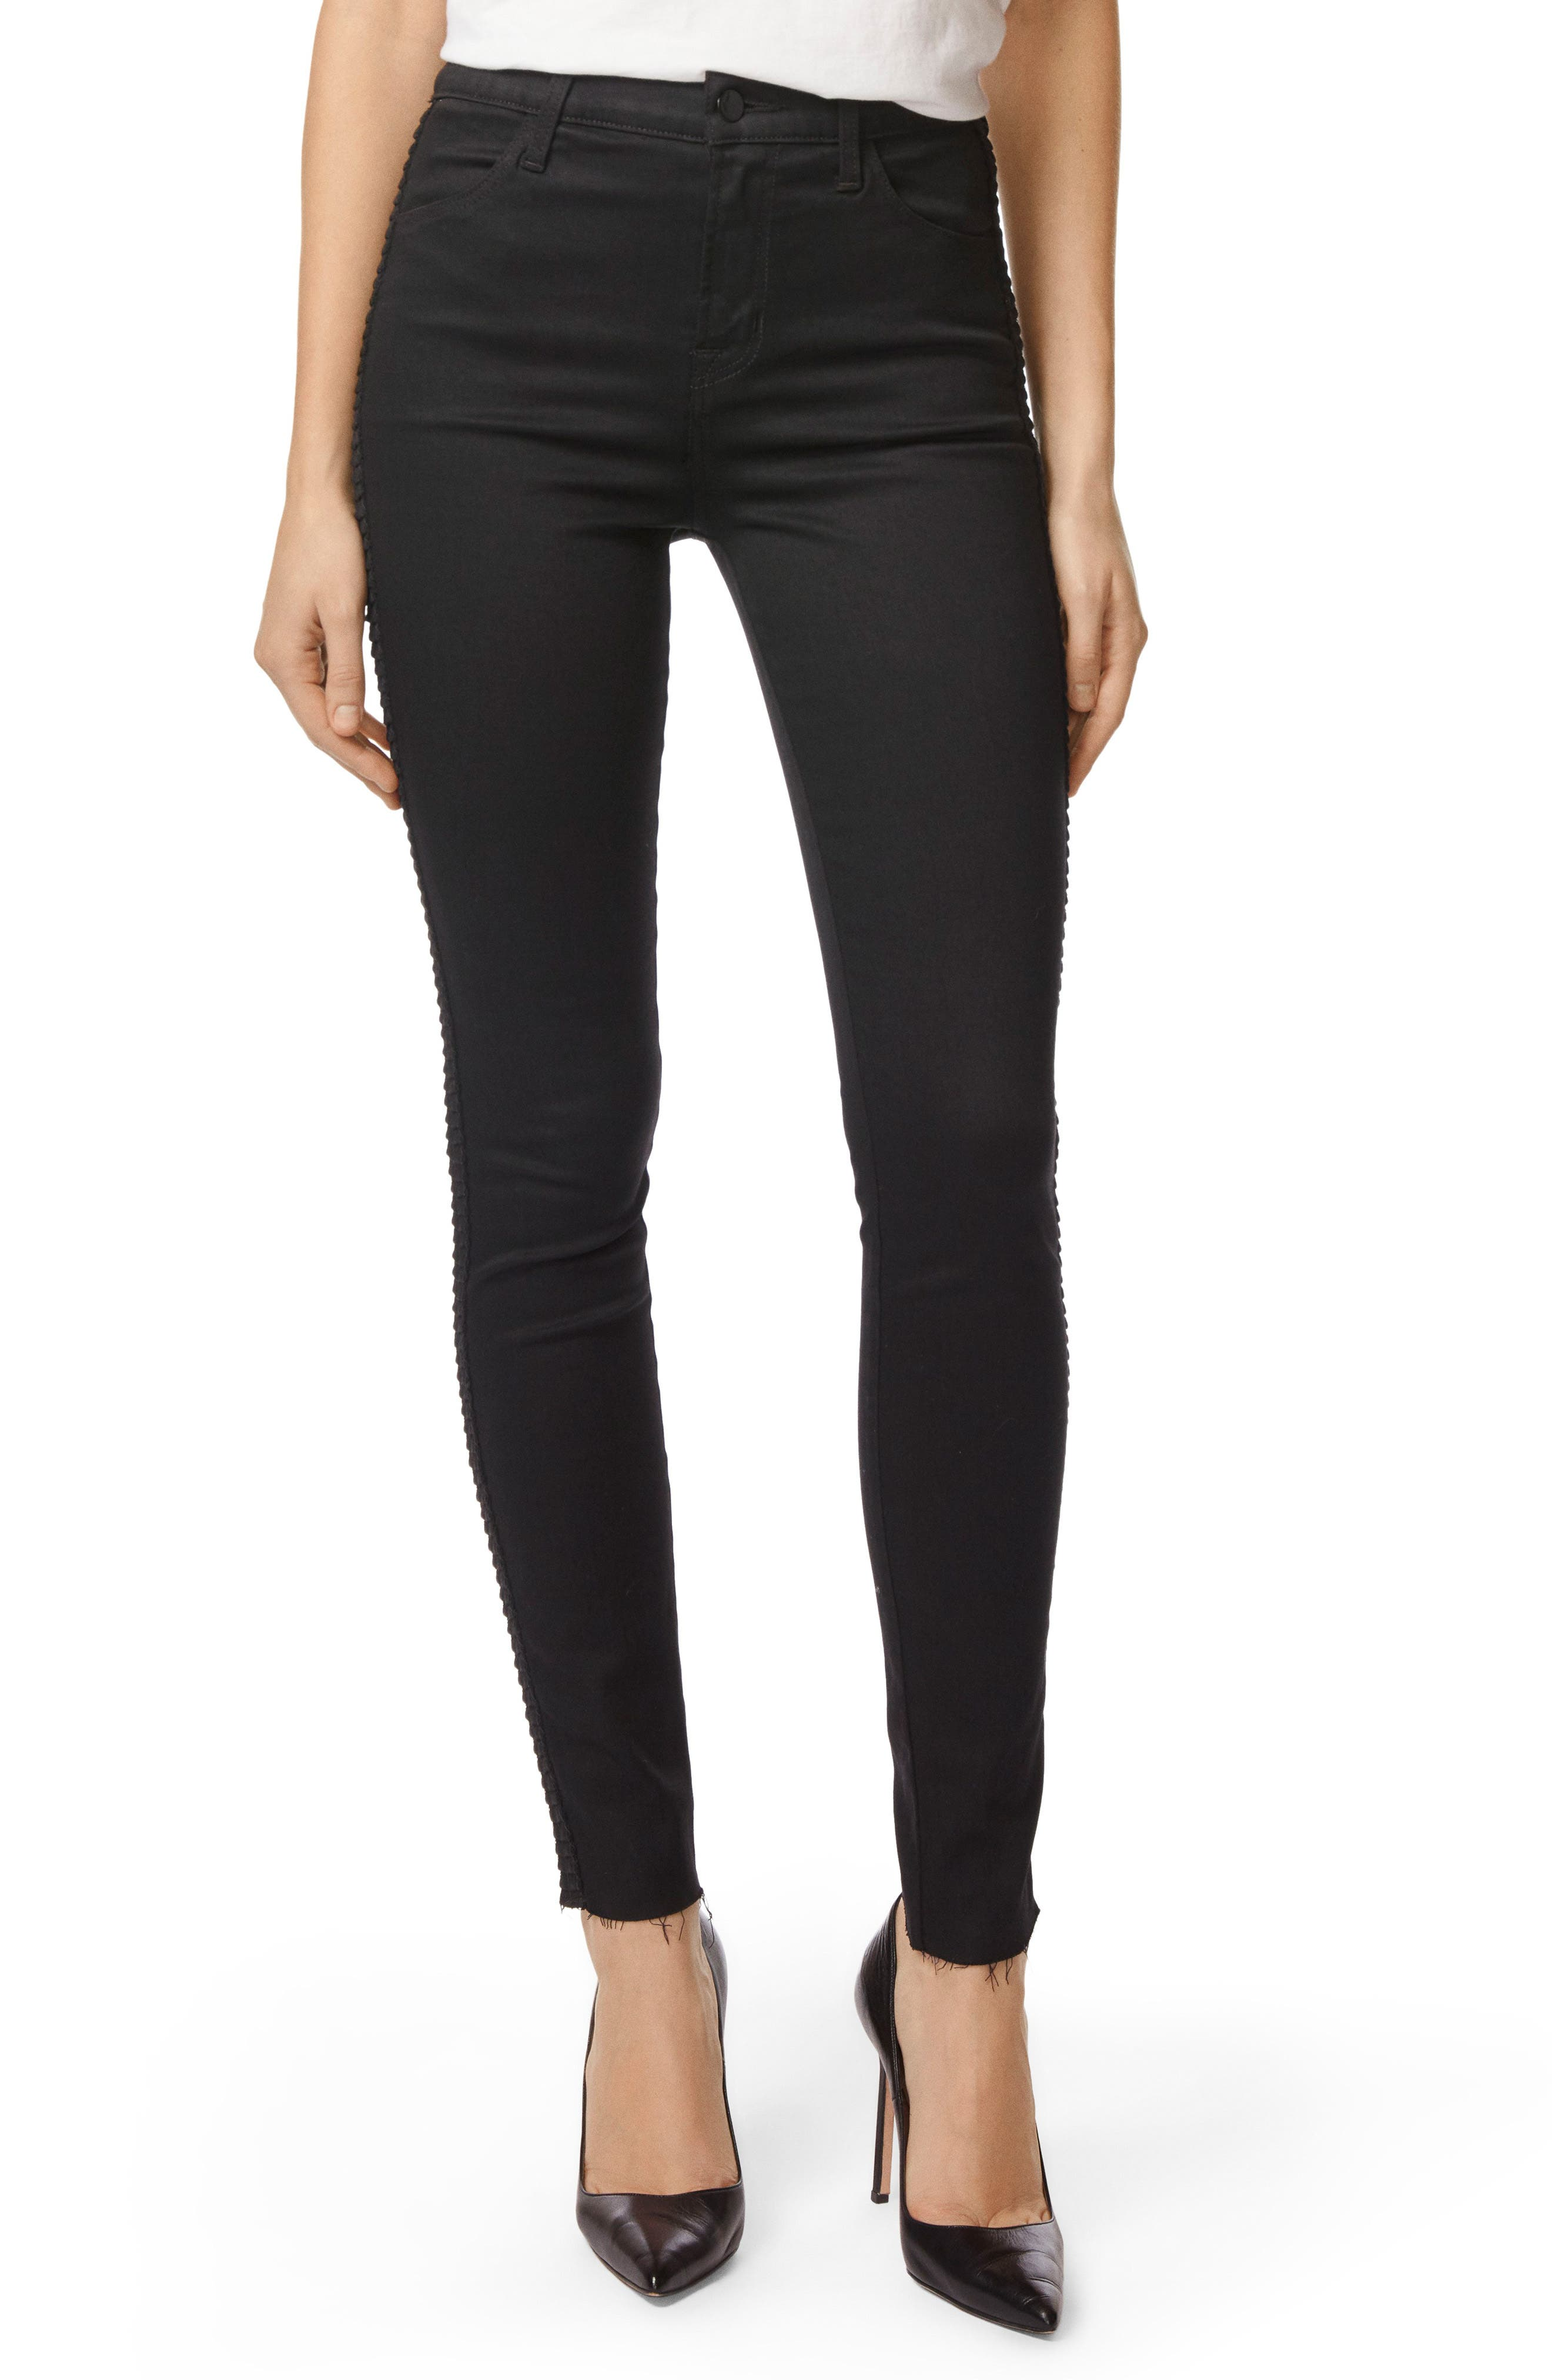 Maria High Waist Skinny Jeans,                             Main thumbnail 1, color,                             009